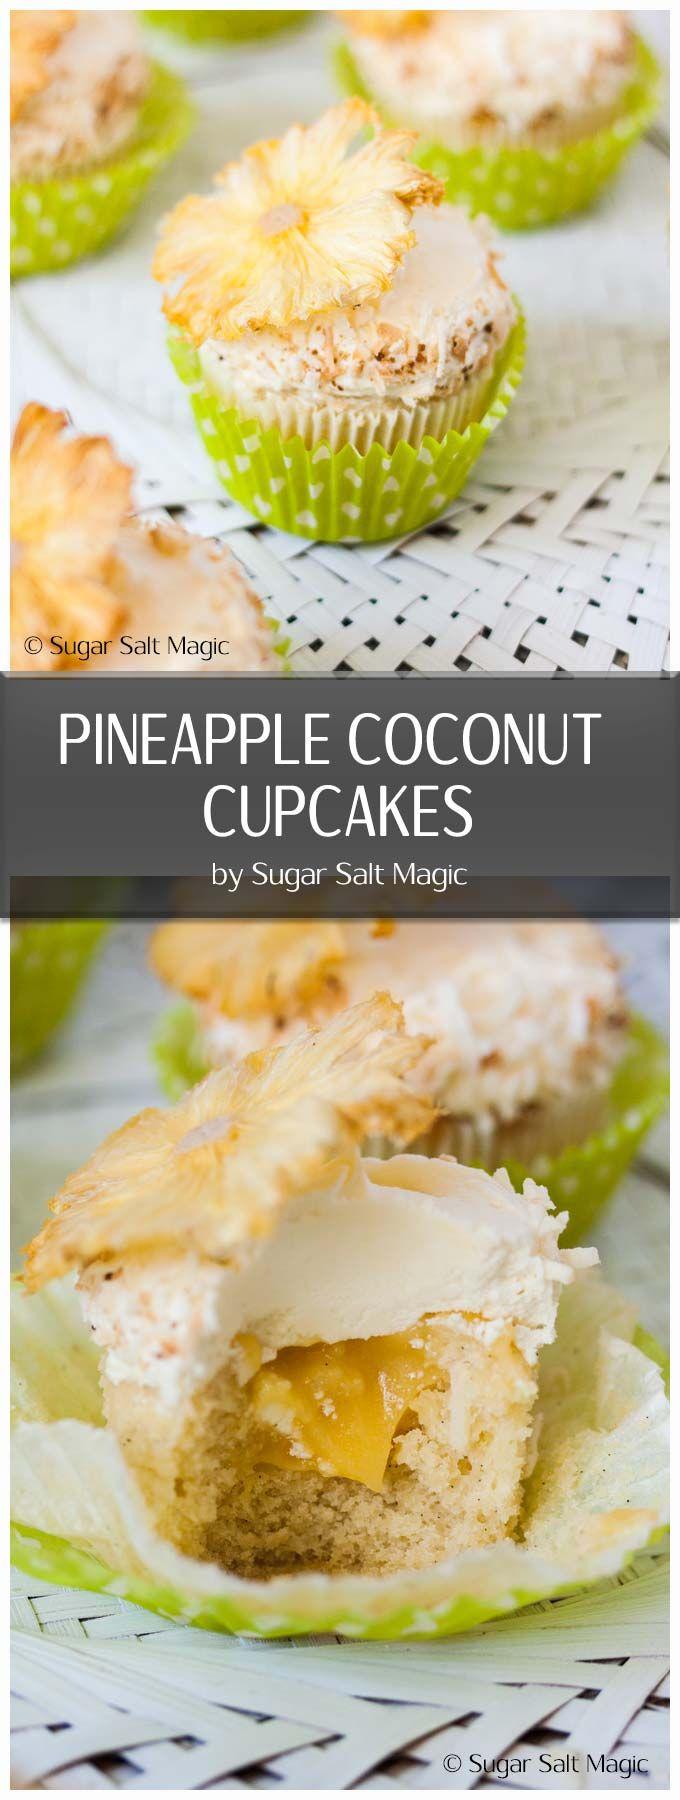 These Pineapple Coconut Cupcakes (aka Pina Colada Cupcakes) are delicious coconut cupcakes filled with homemade pineapple curd. #coconutcupcakes #pinacolada via @sugarsaltmagic